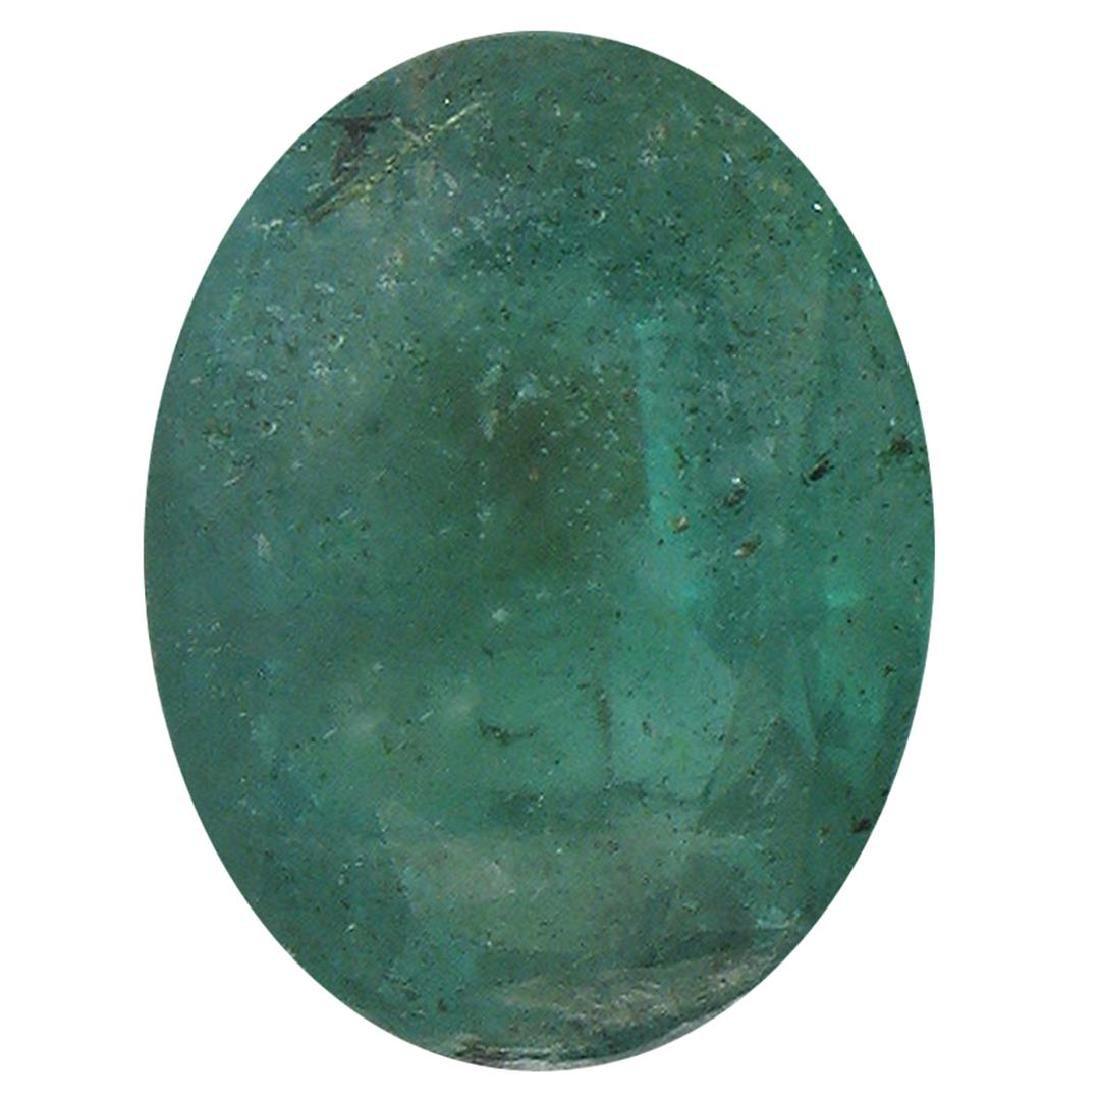 4.07 ctw Oval Emerald Parcel